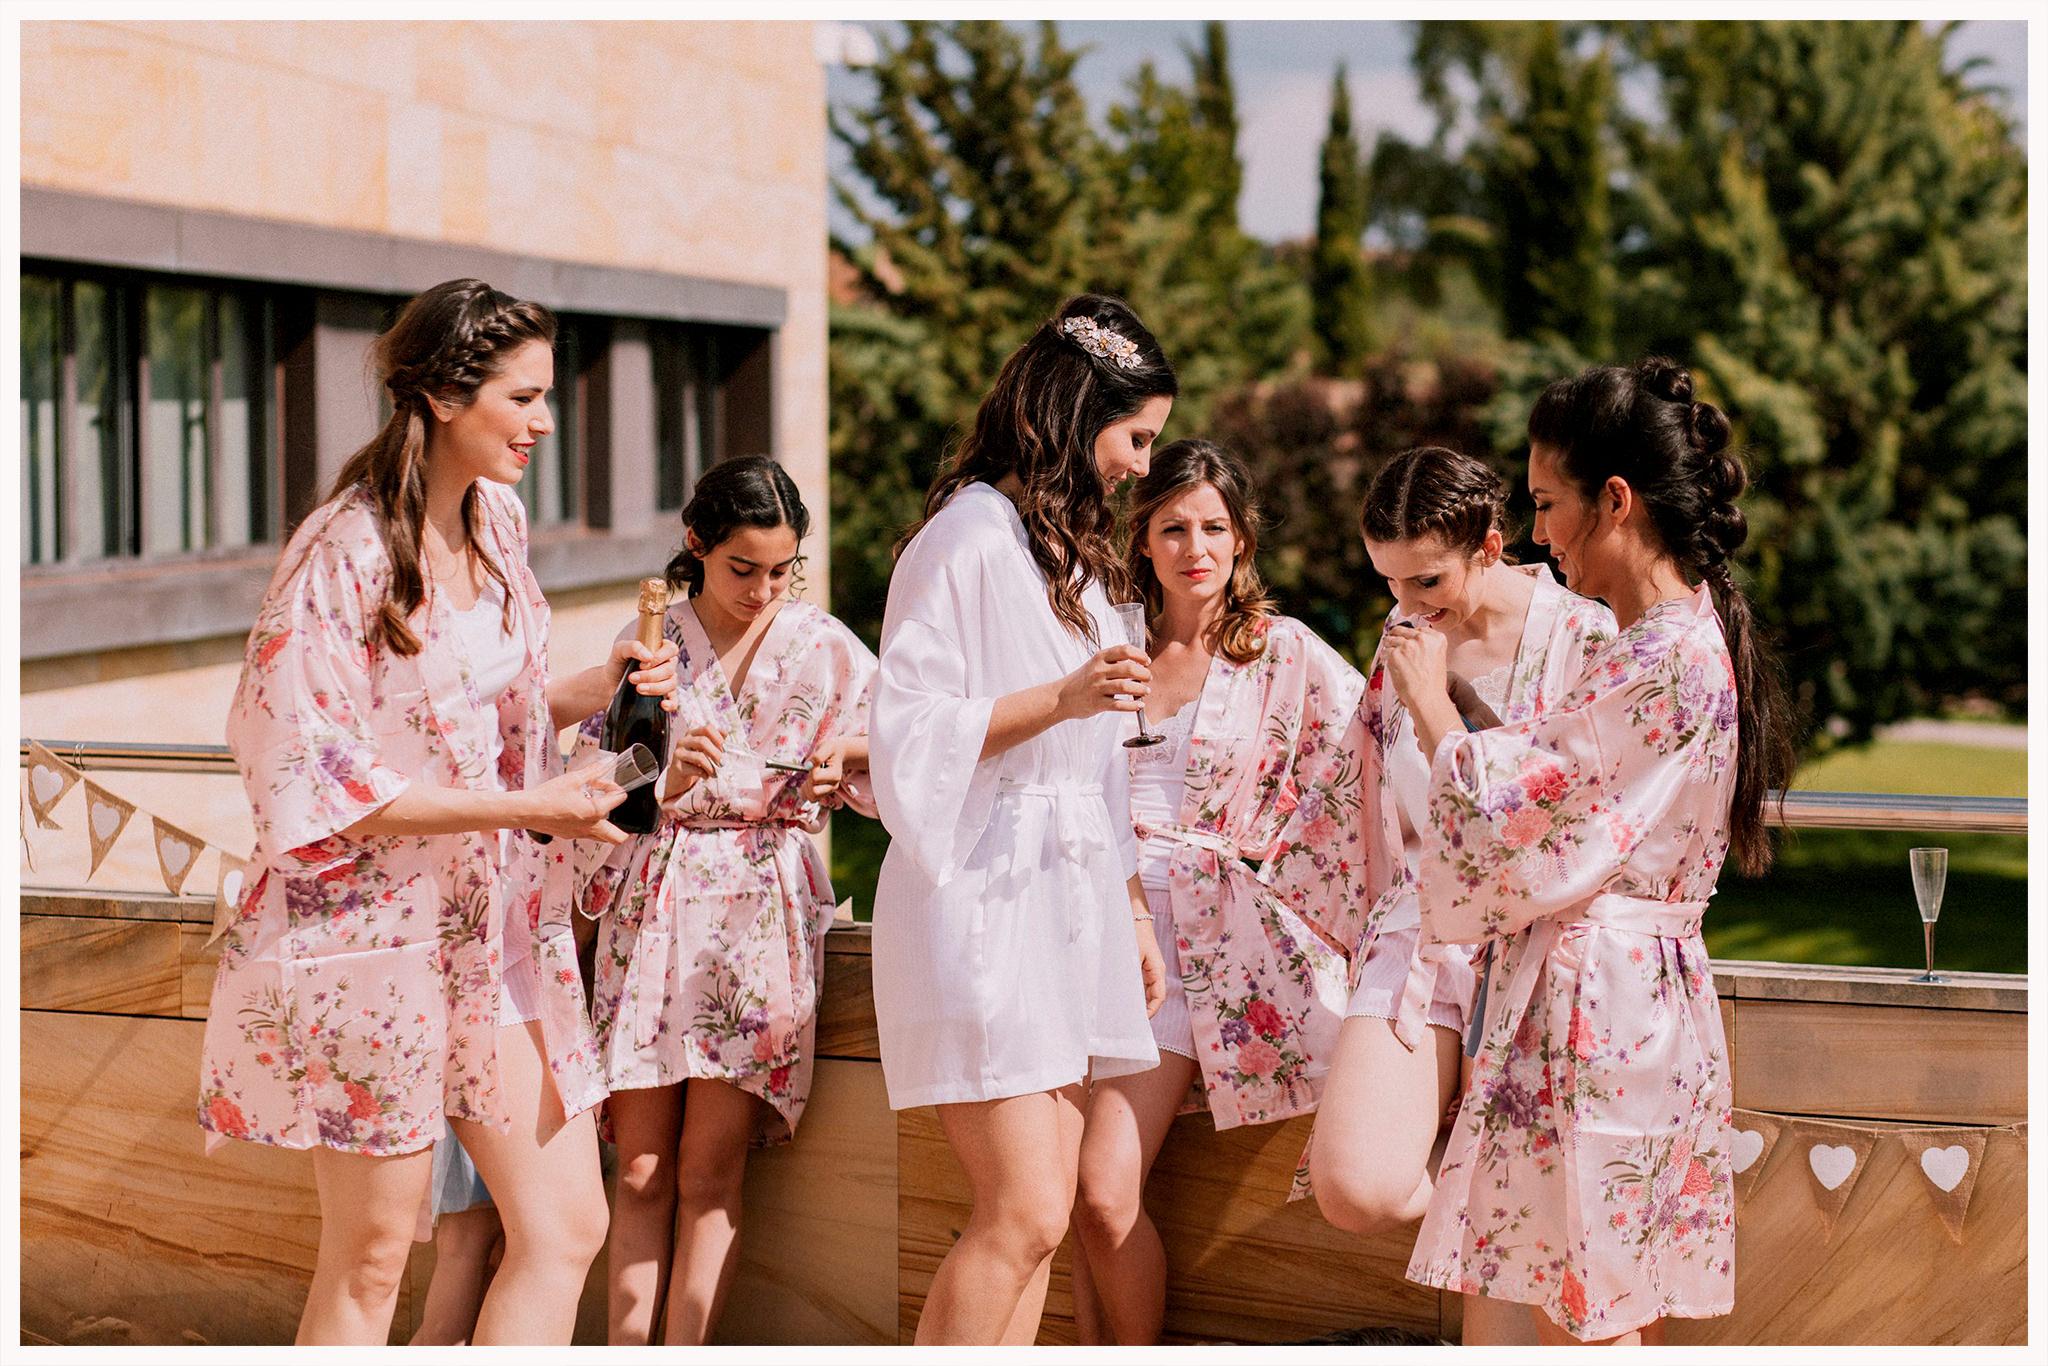 dreamsanddreamers.com-nunta-timisoara-12.jpg